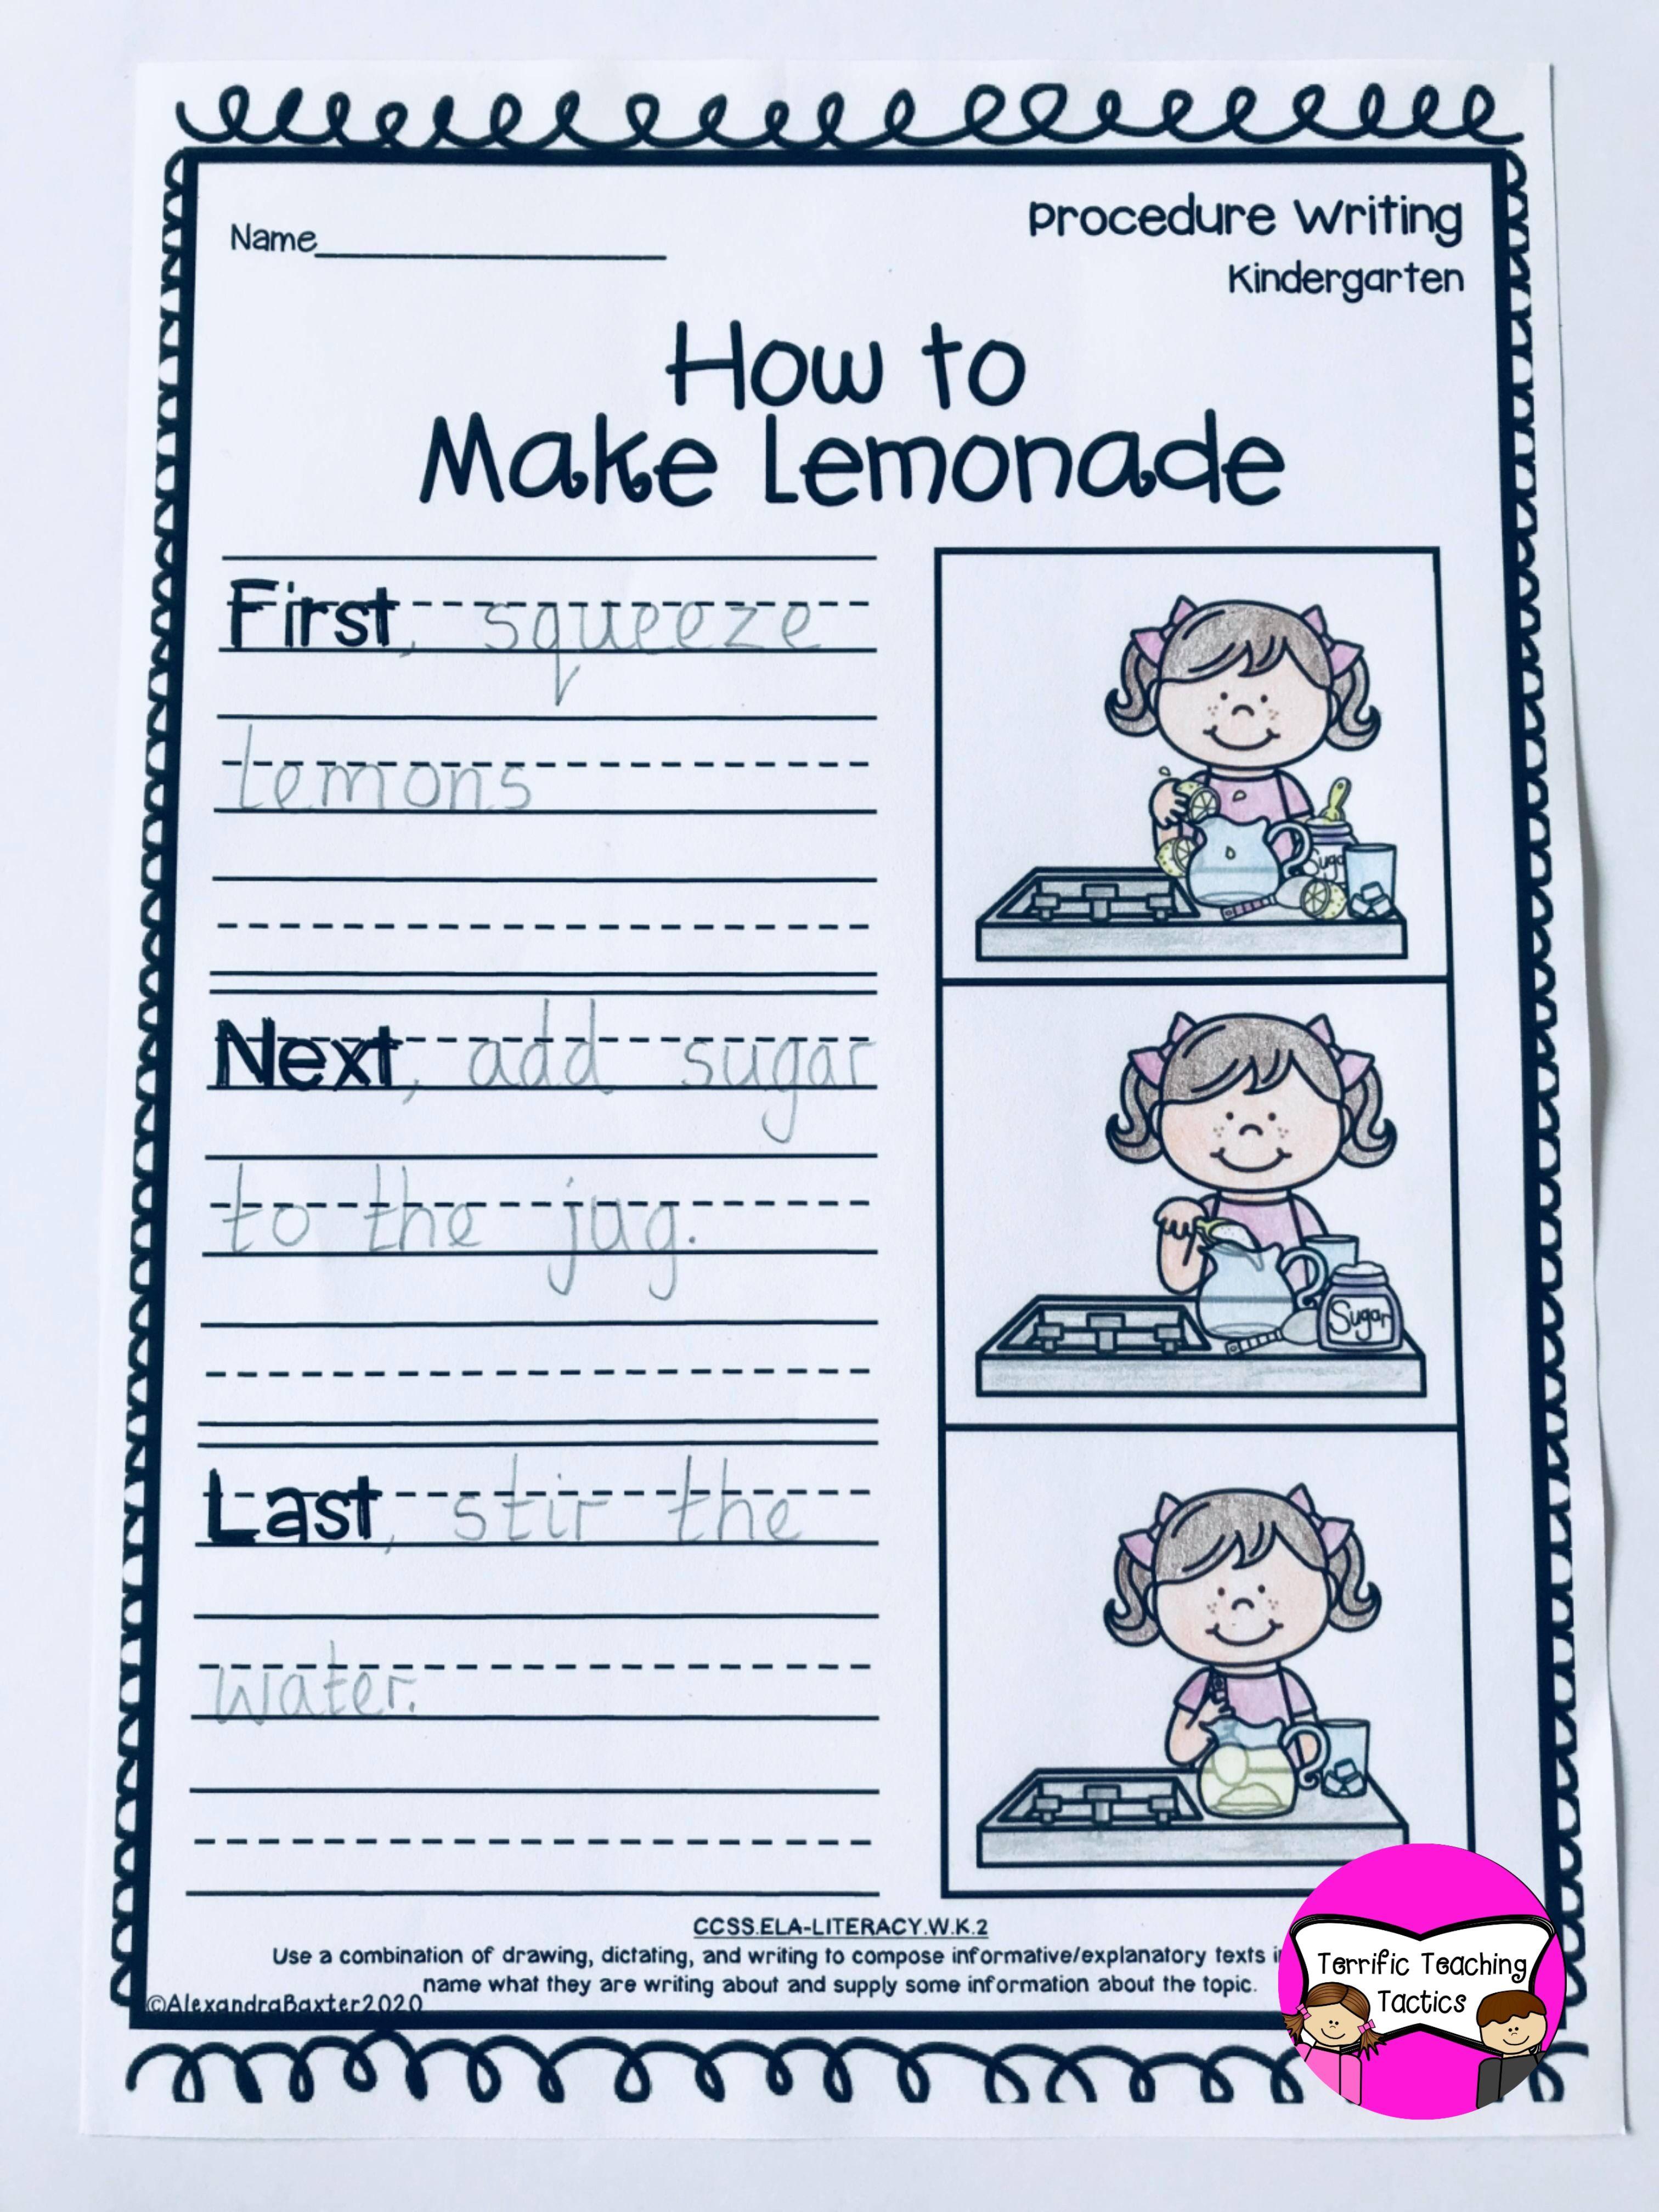 medium resolution of How to Make Lemonade Worksheet   Procedural writing